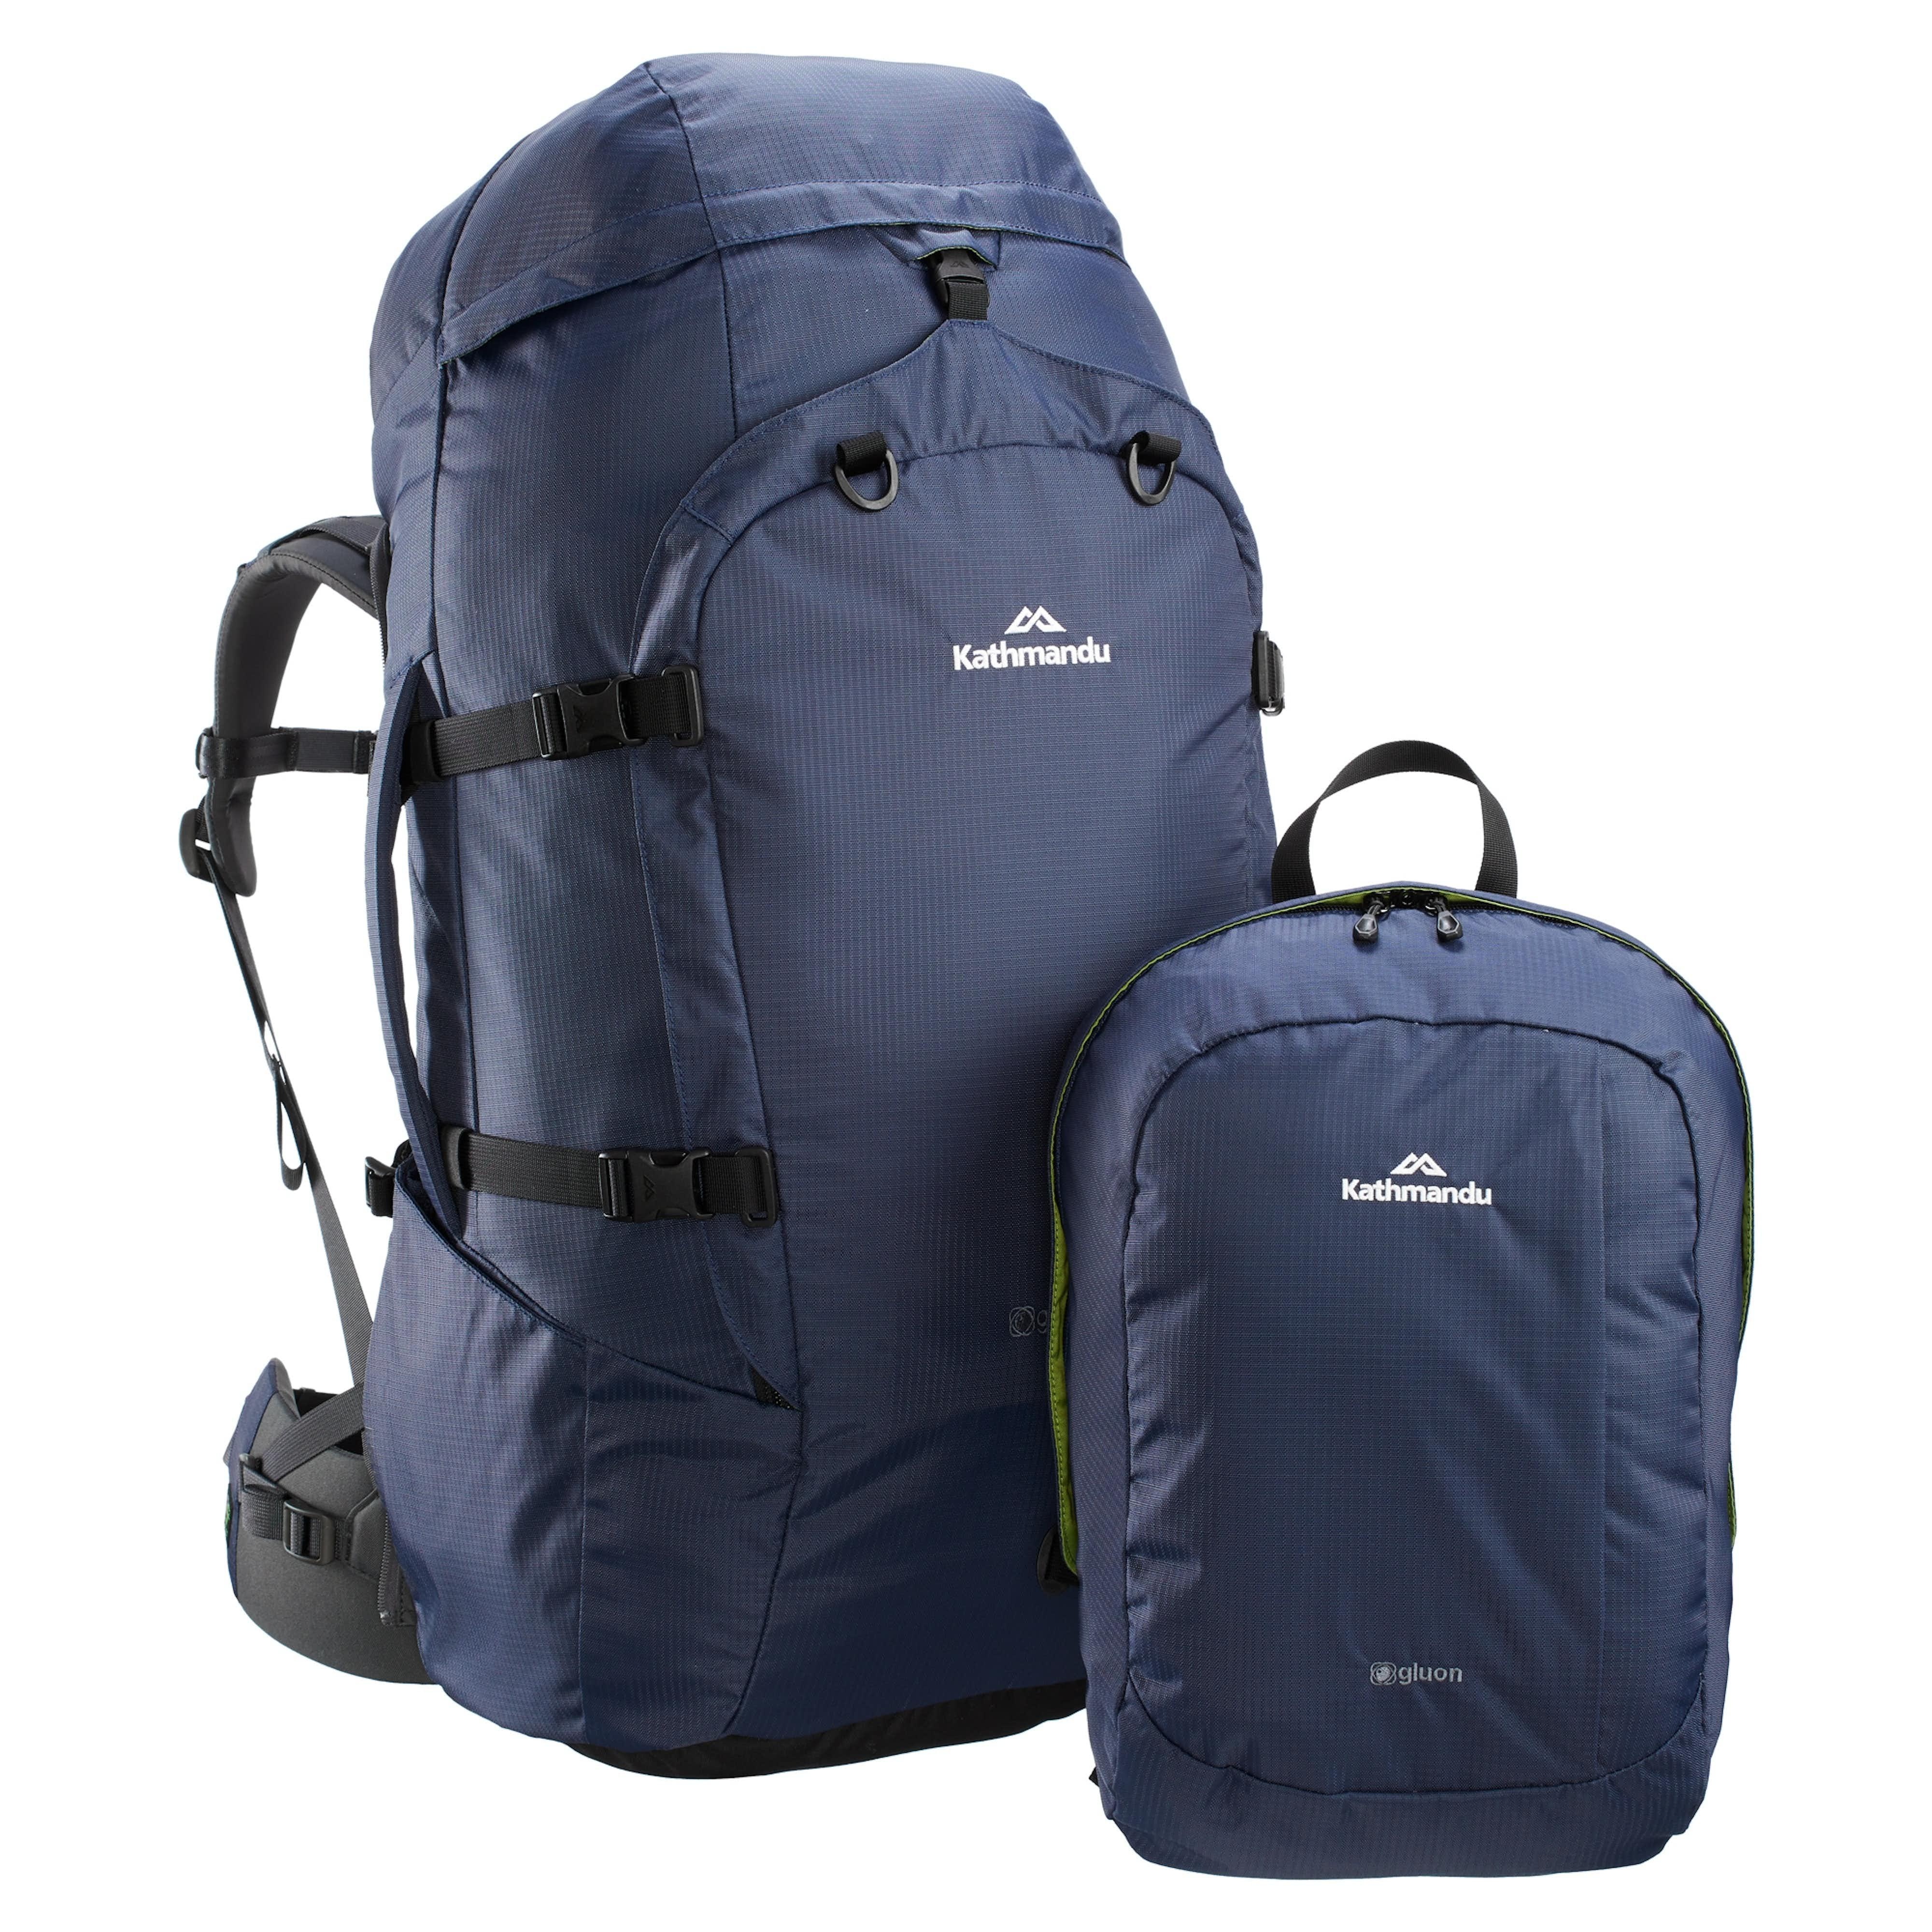 69659daad962 Travel Backpacks for Women   Men for Sale